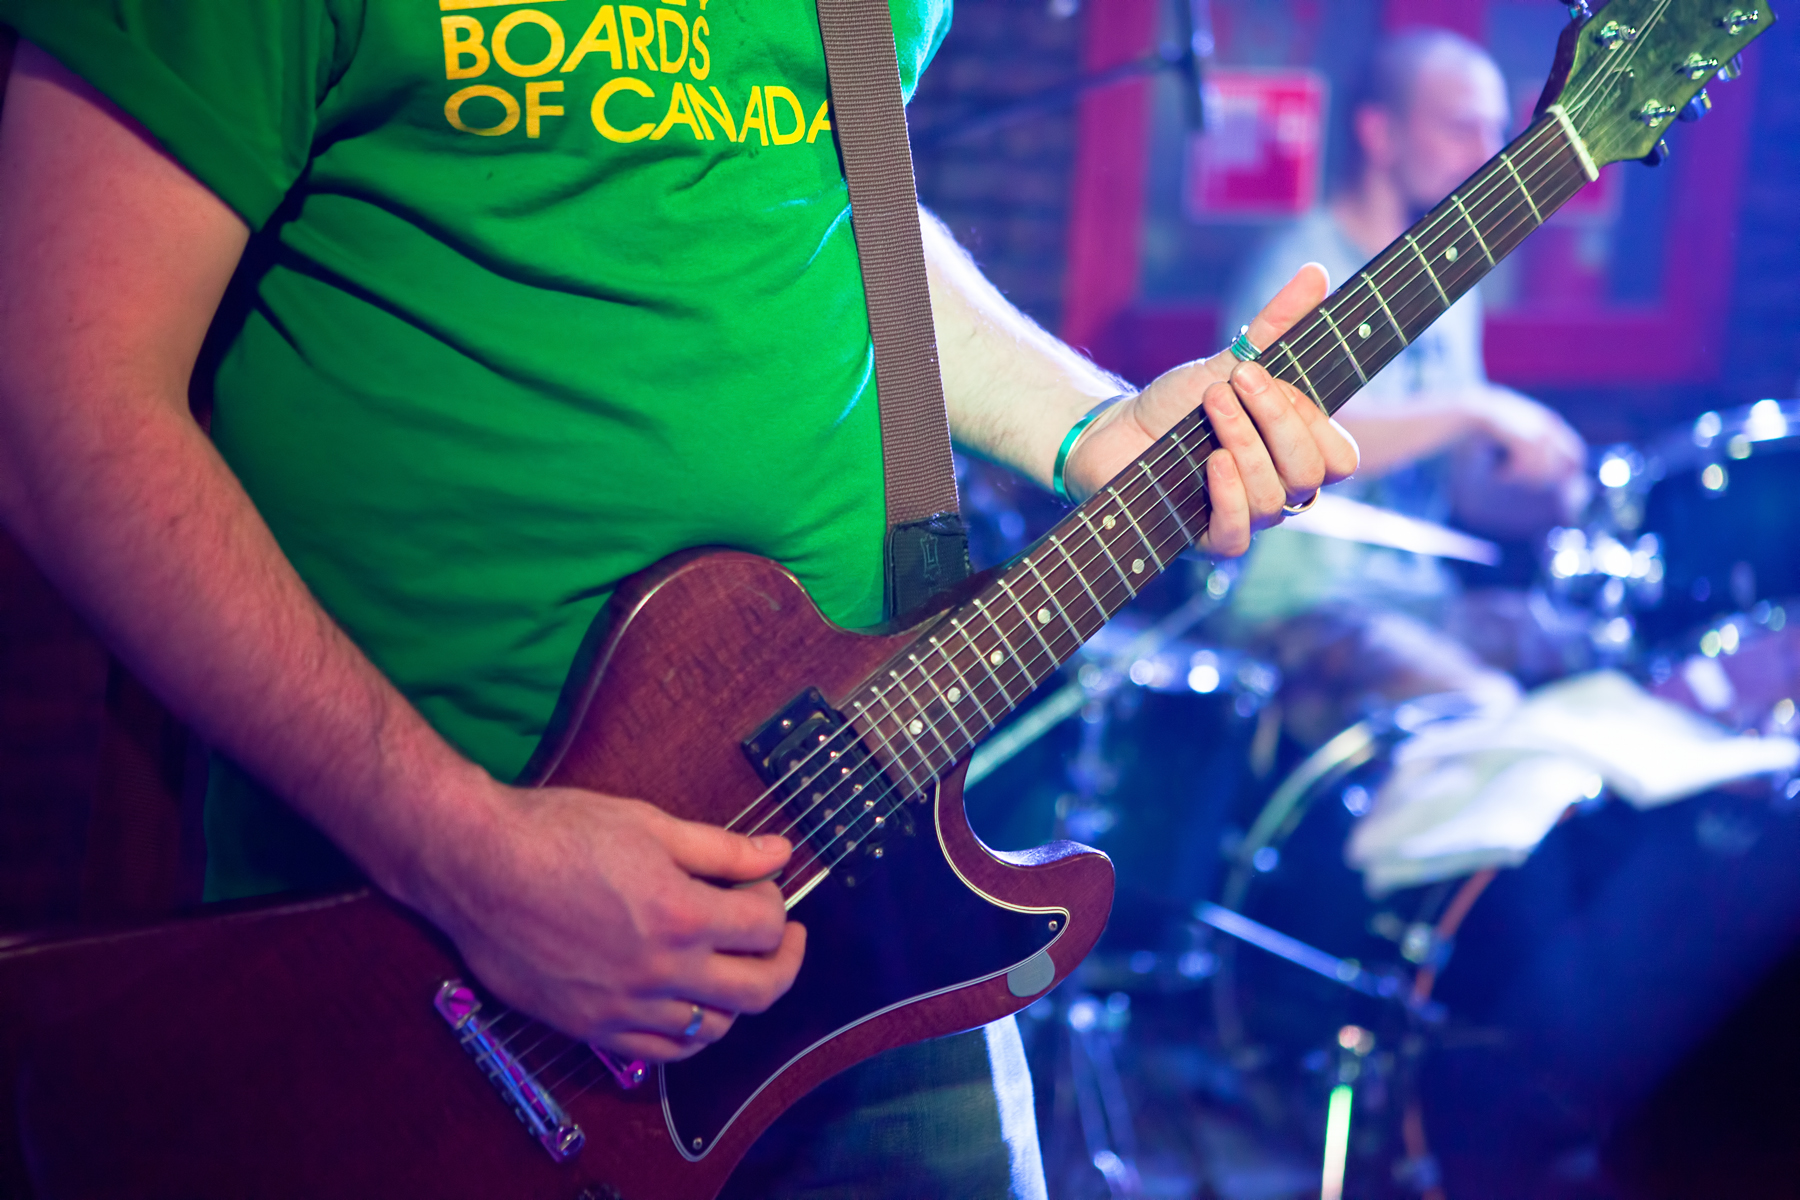 Guitar player, Band, Musician, Sound, Rock, HQ Photo